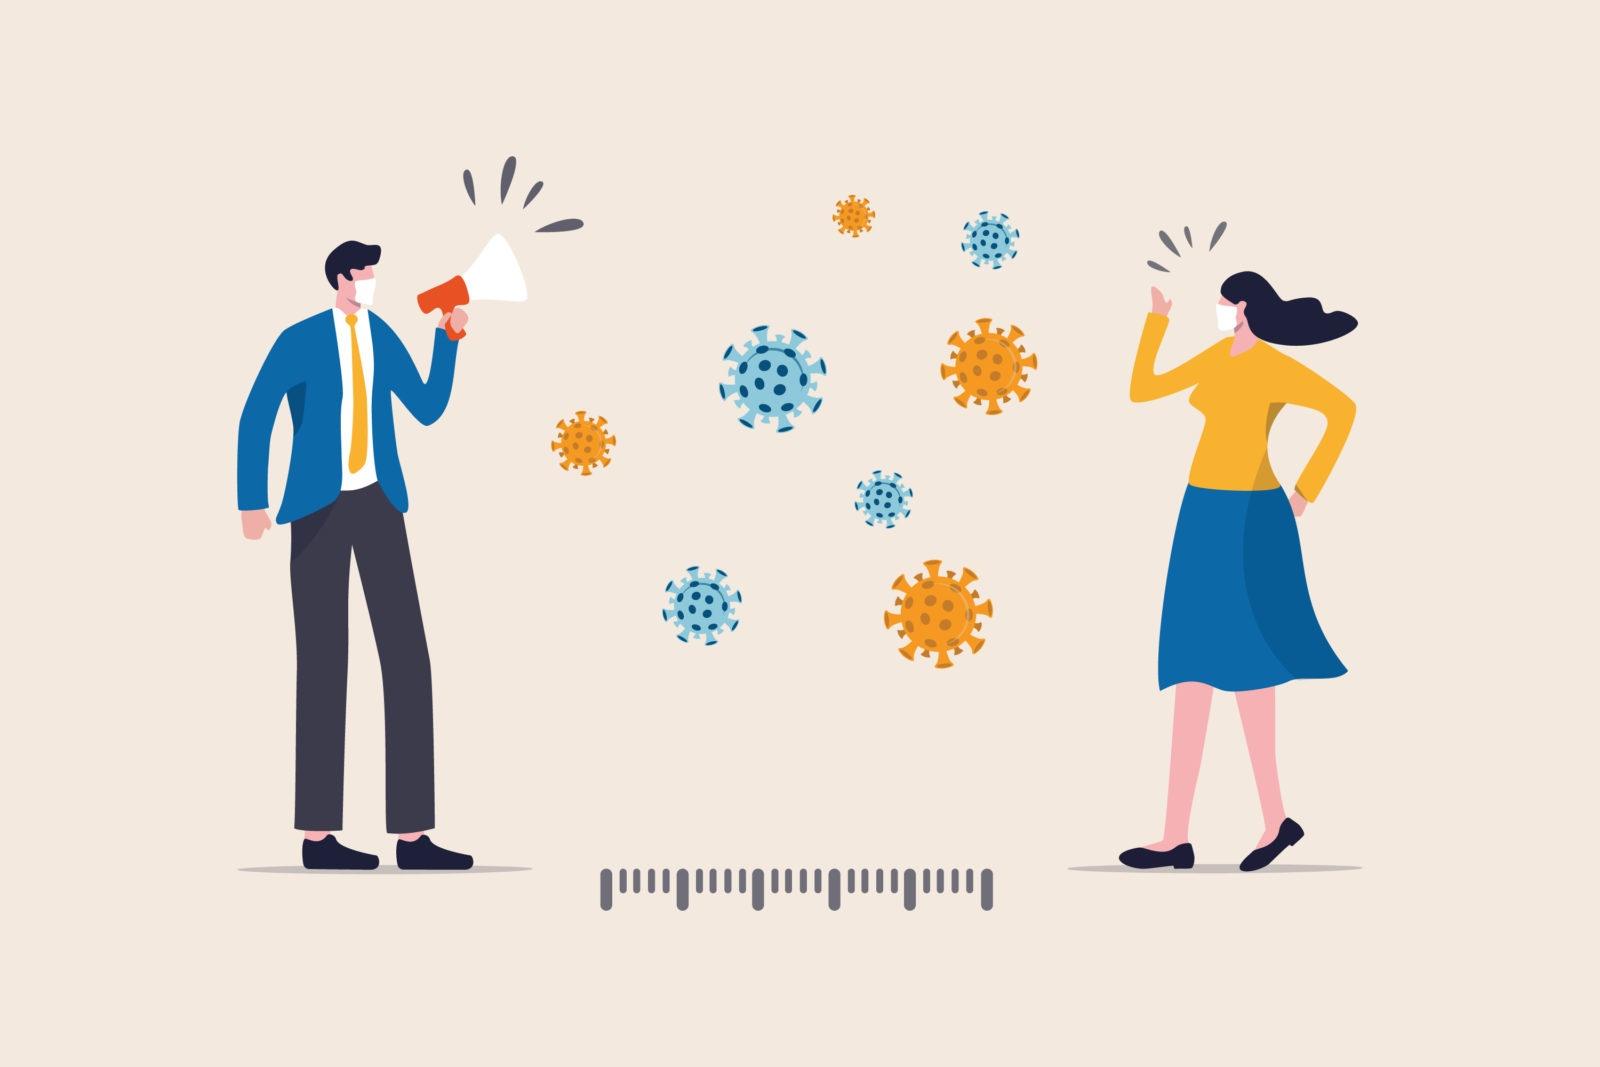 Social distancing vs physical distancing